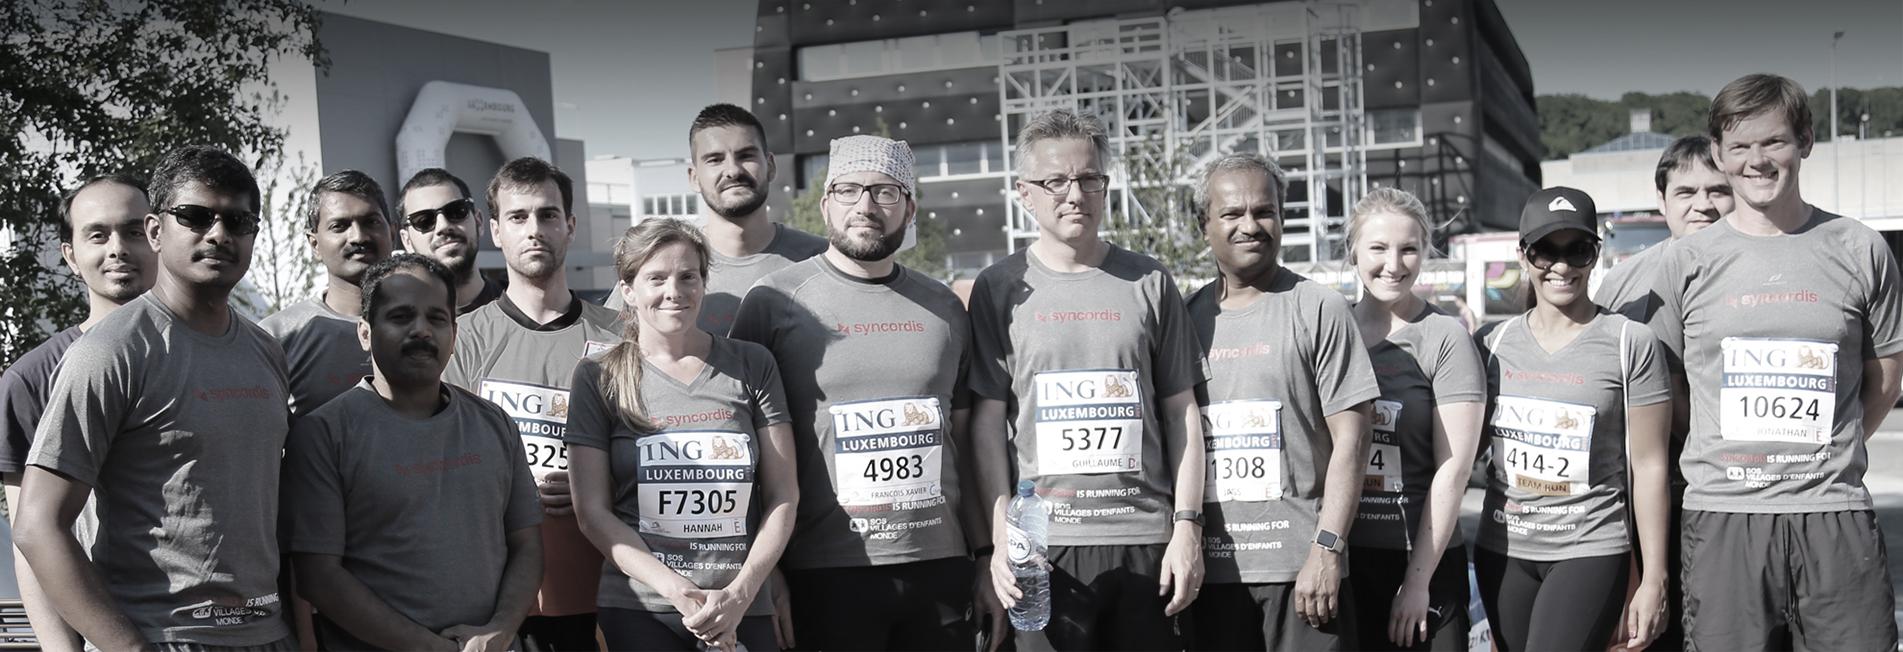 Syncordis ING Marathon Team